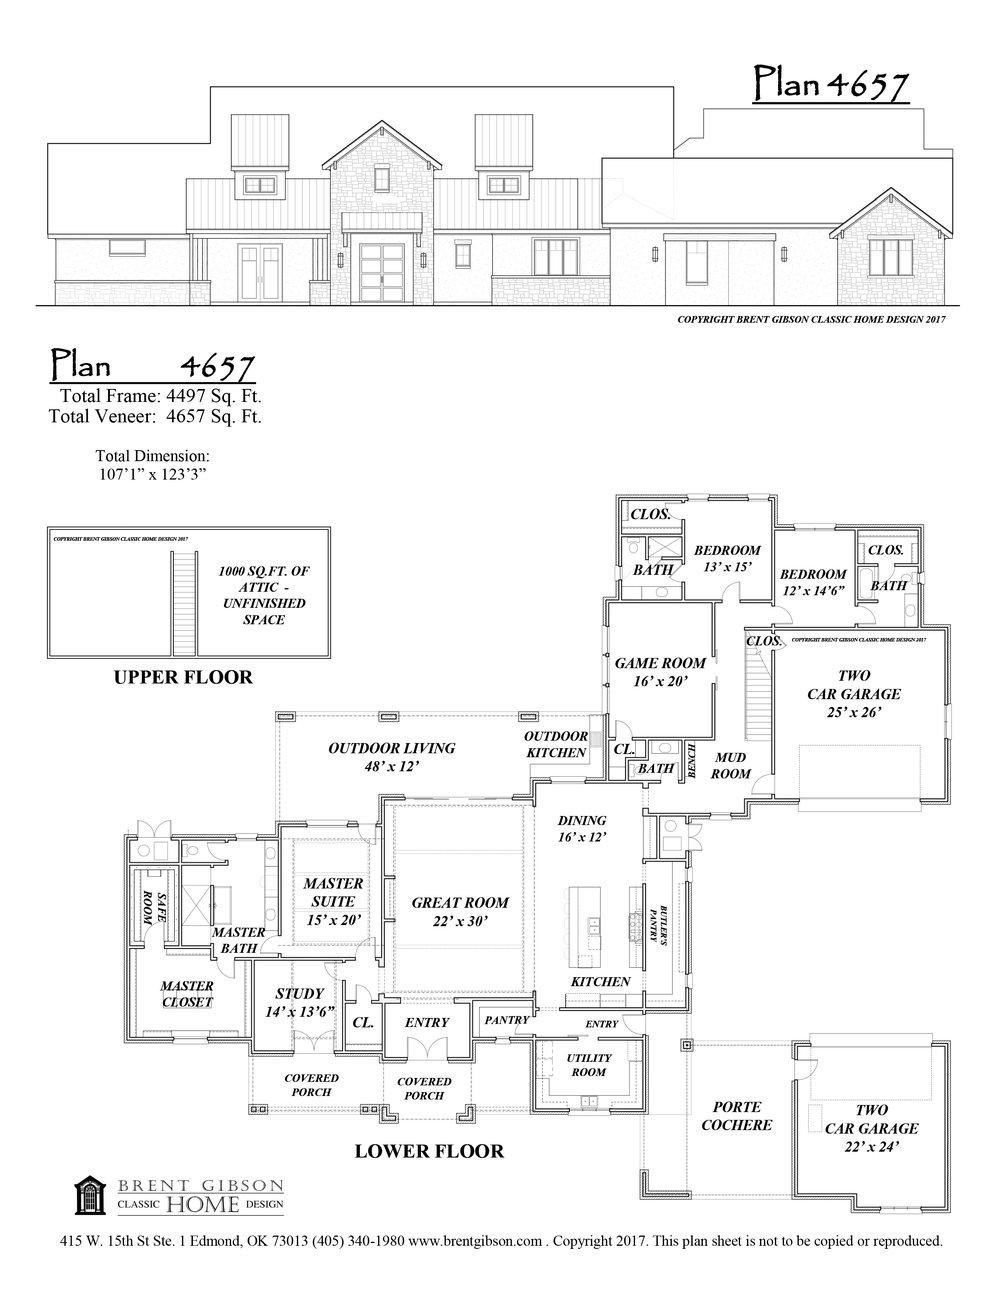 Plan 4657 Brochure.jpg